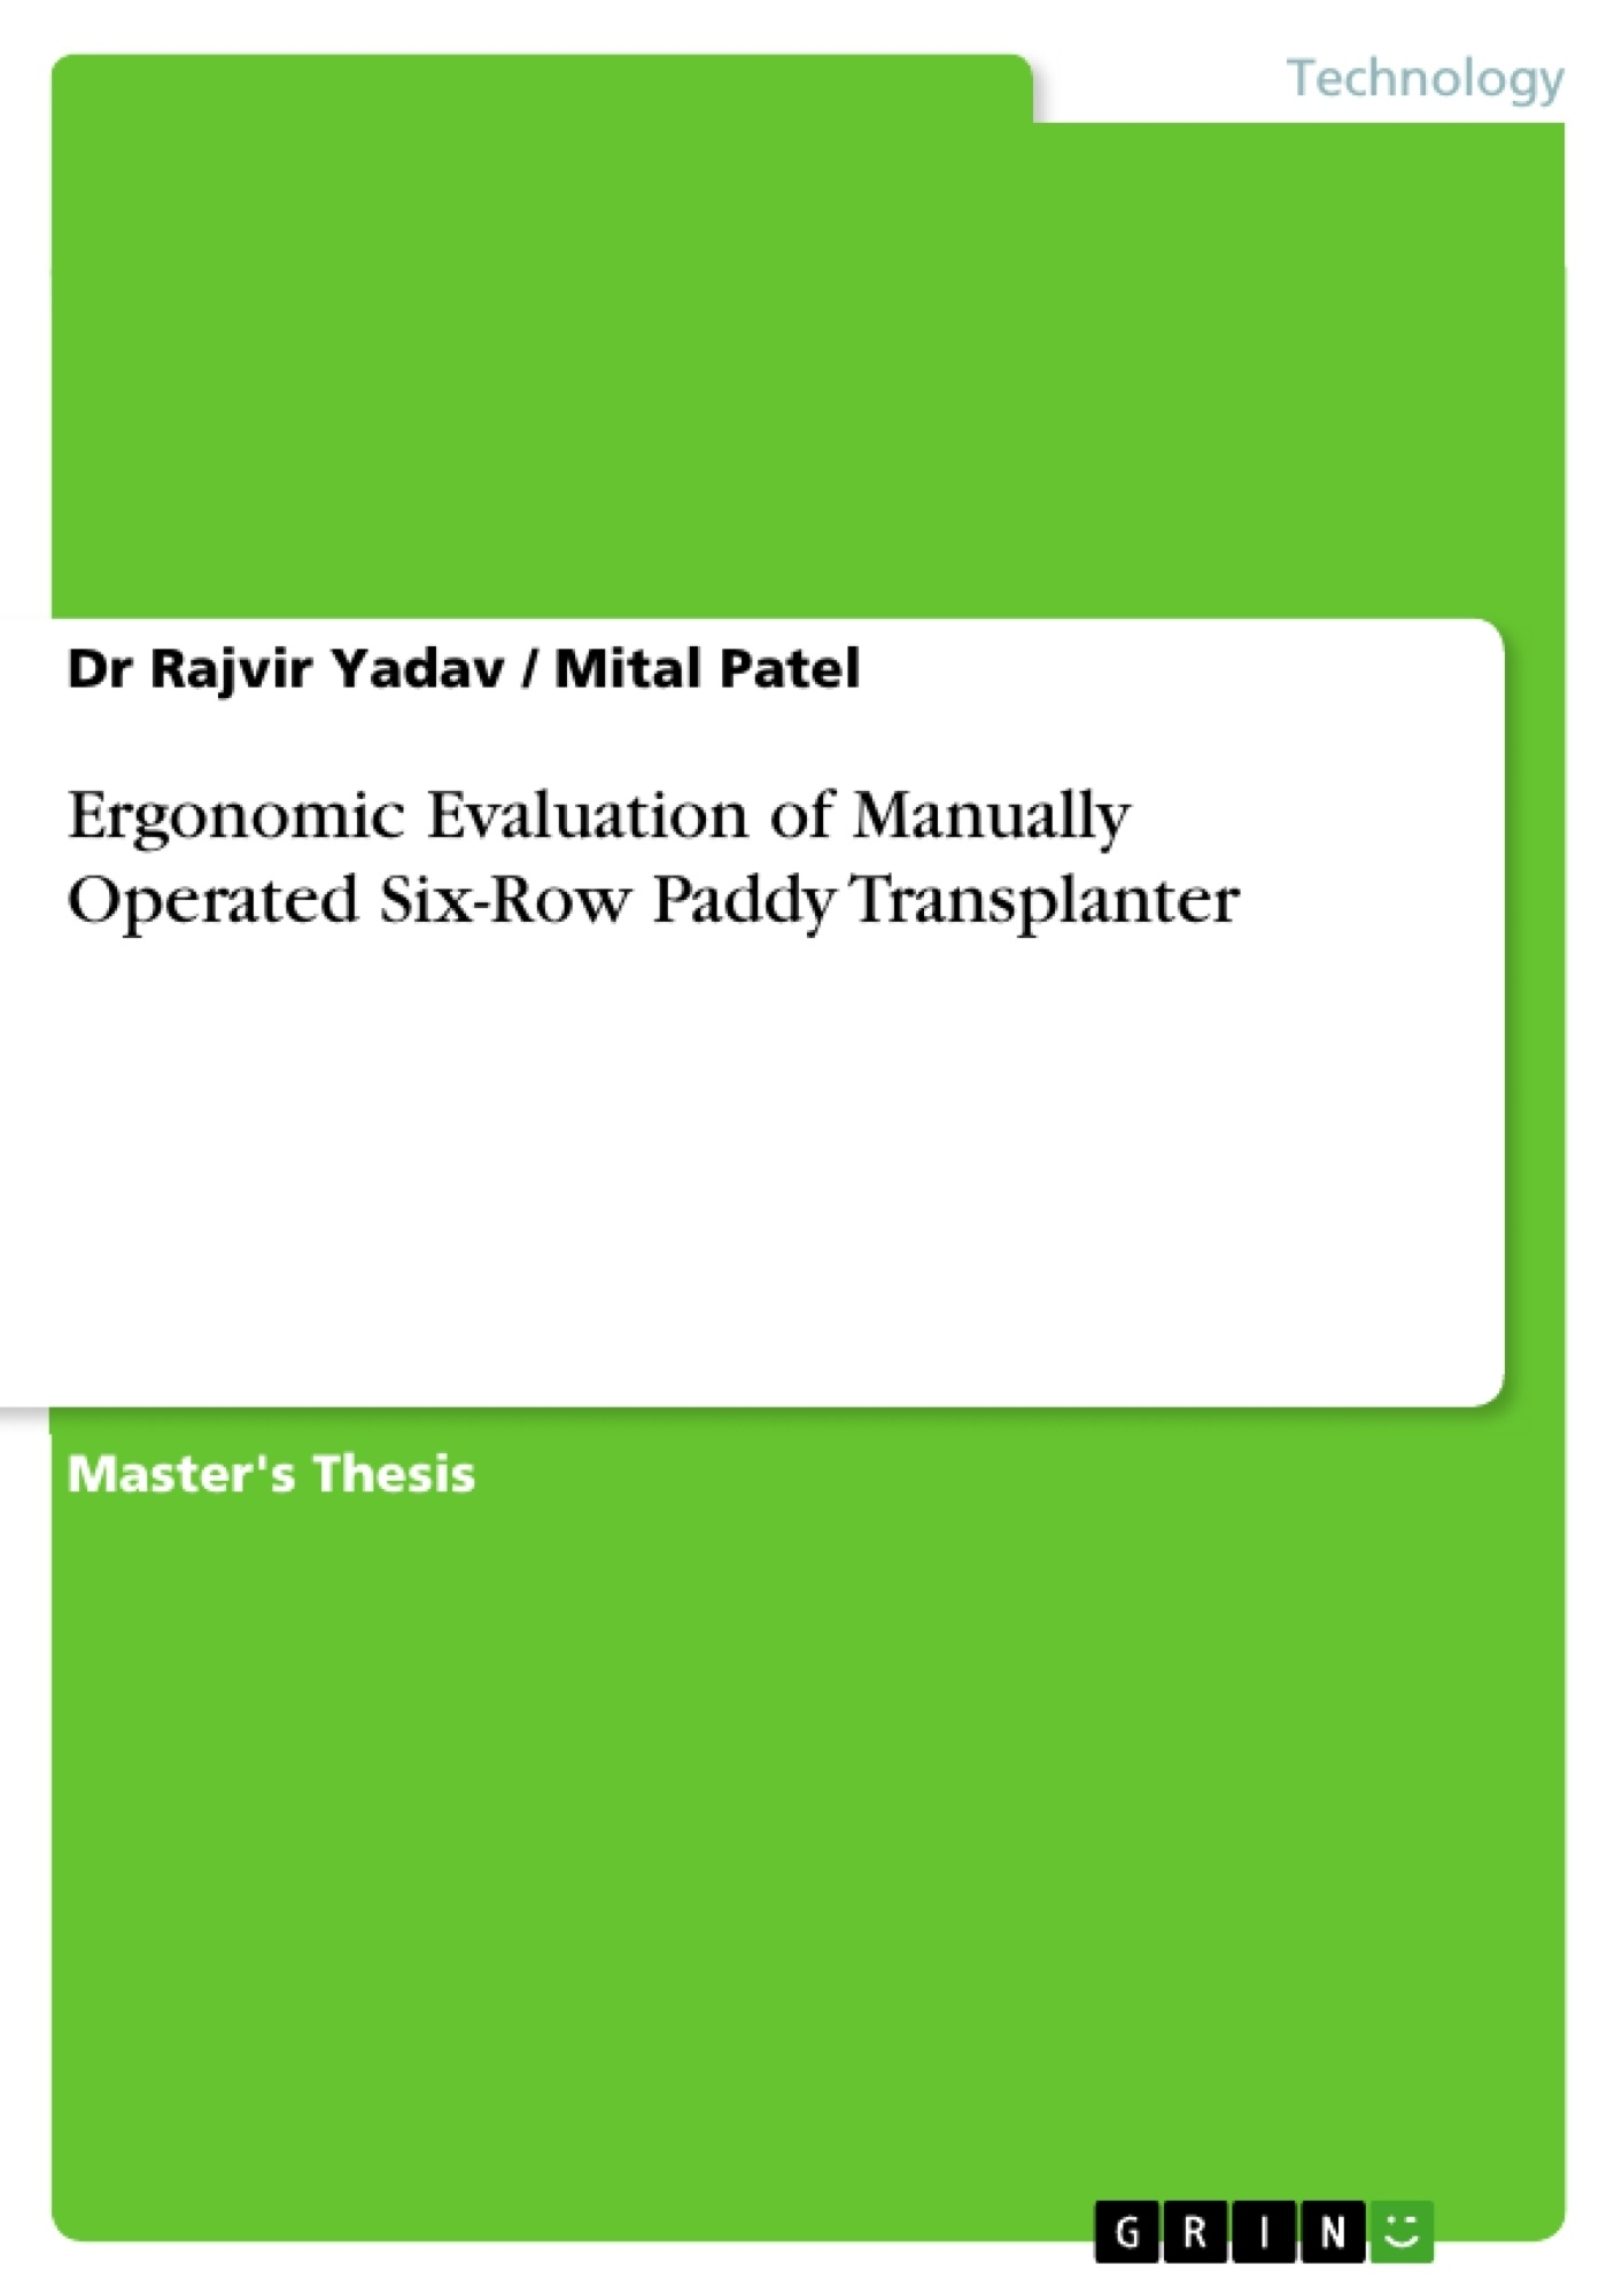 Title: Ergonomic Evaluation of Manually Operated Six-Row Paddy Transplanter